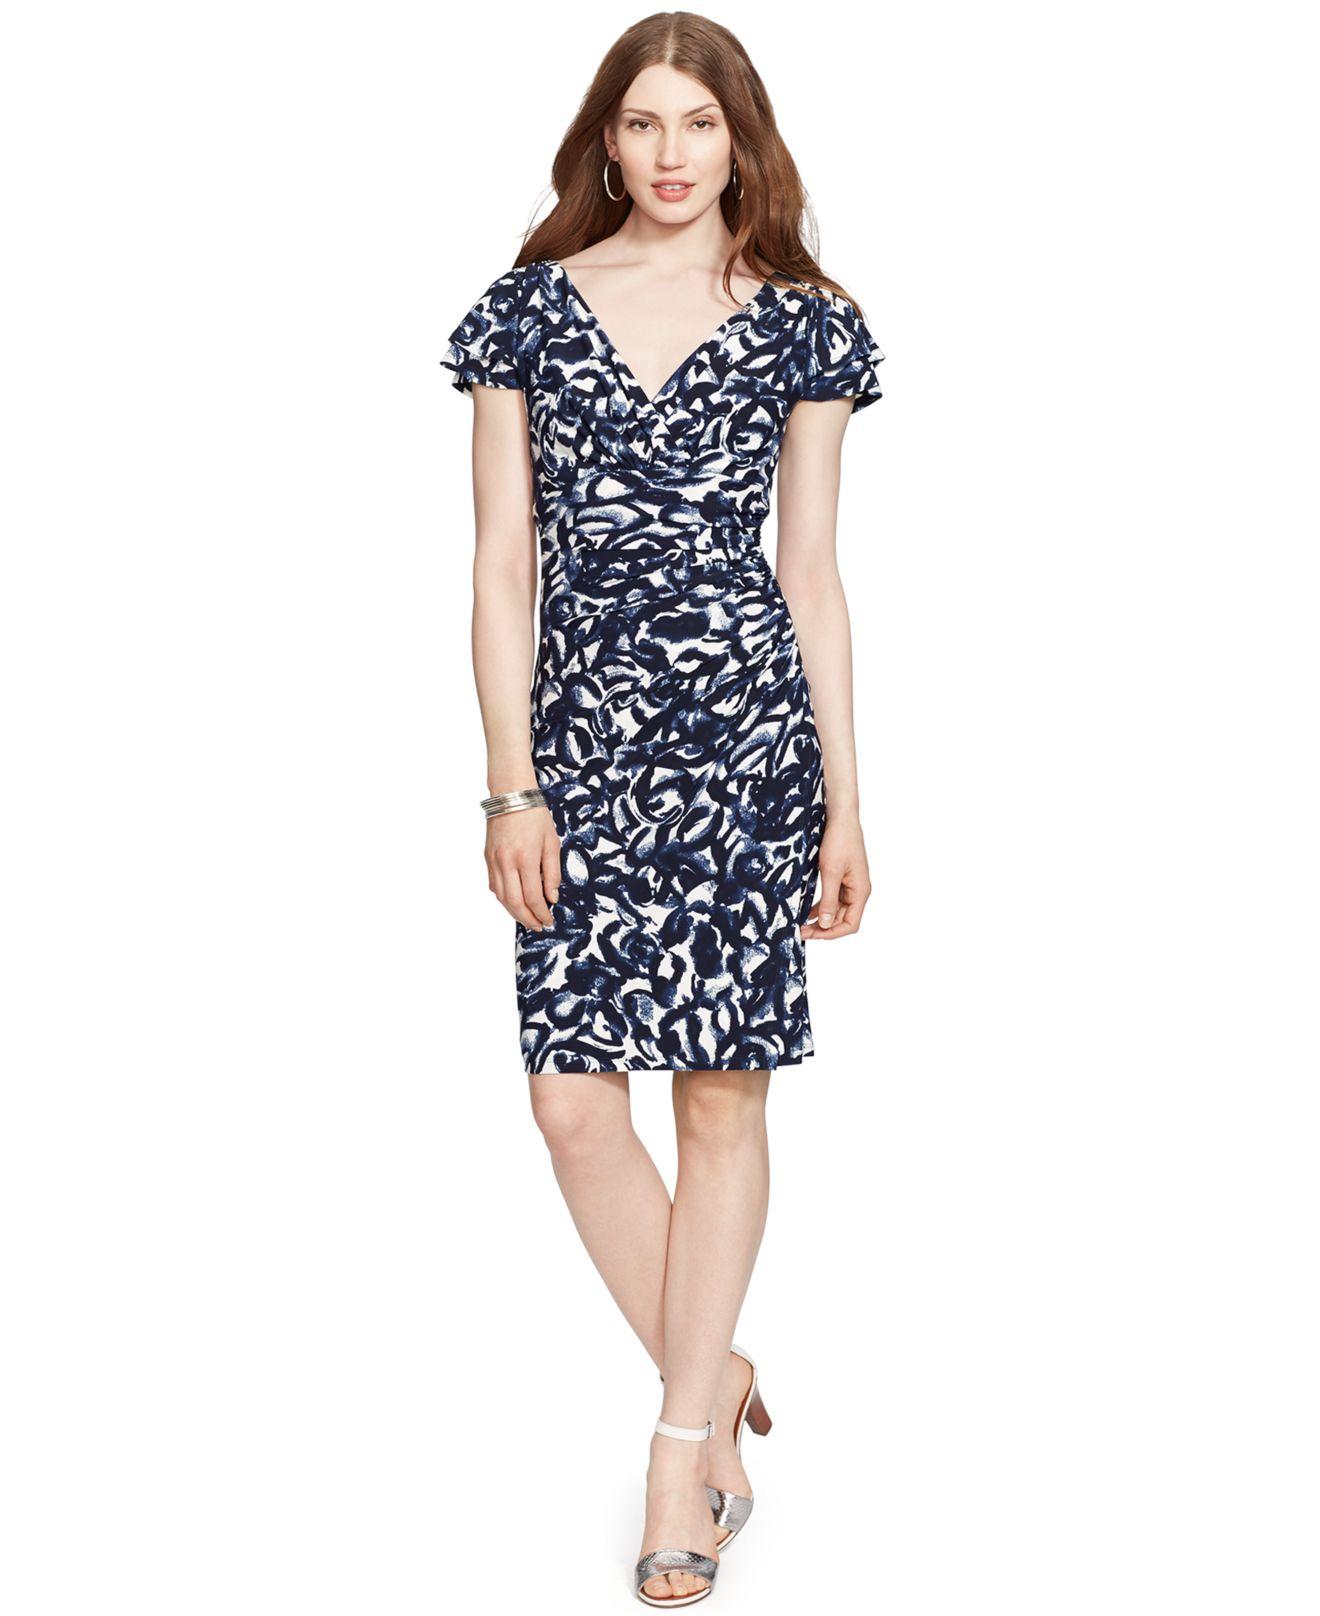 Lauren By Ralph Lauren Petite Flutter Sleeve Ruched Dress